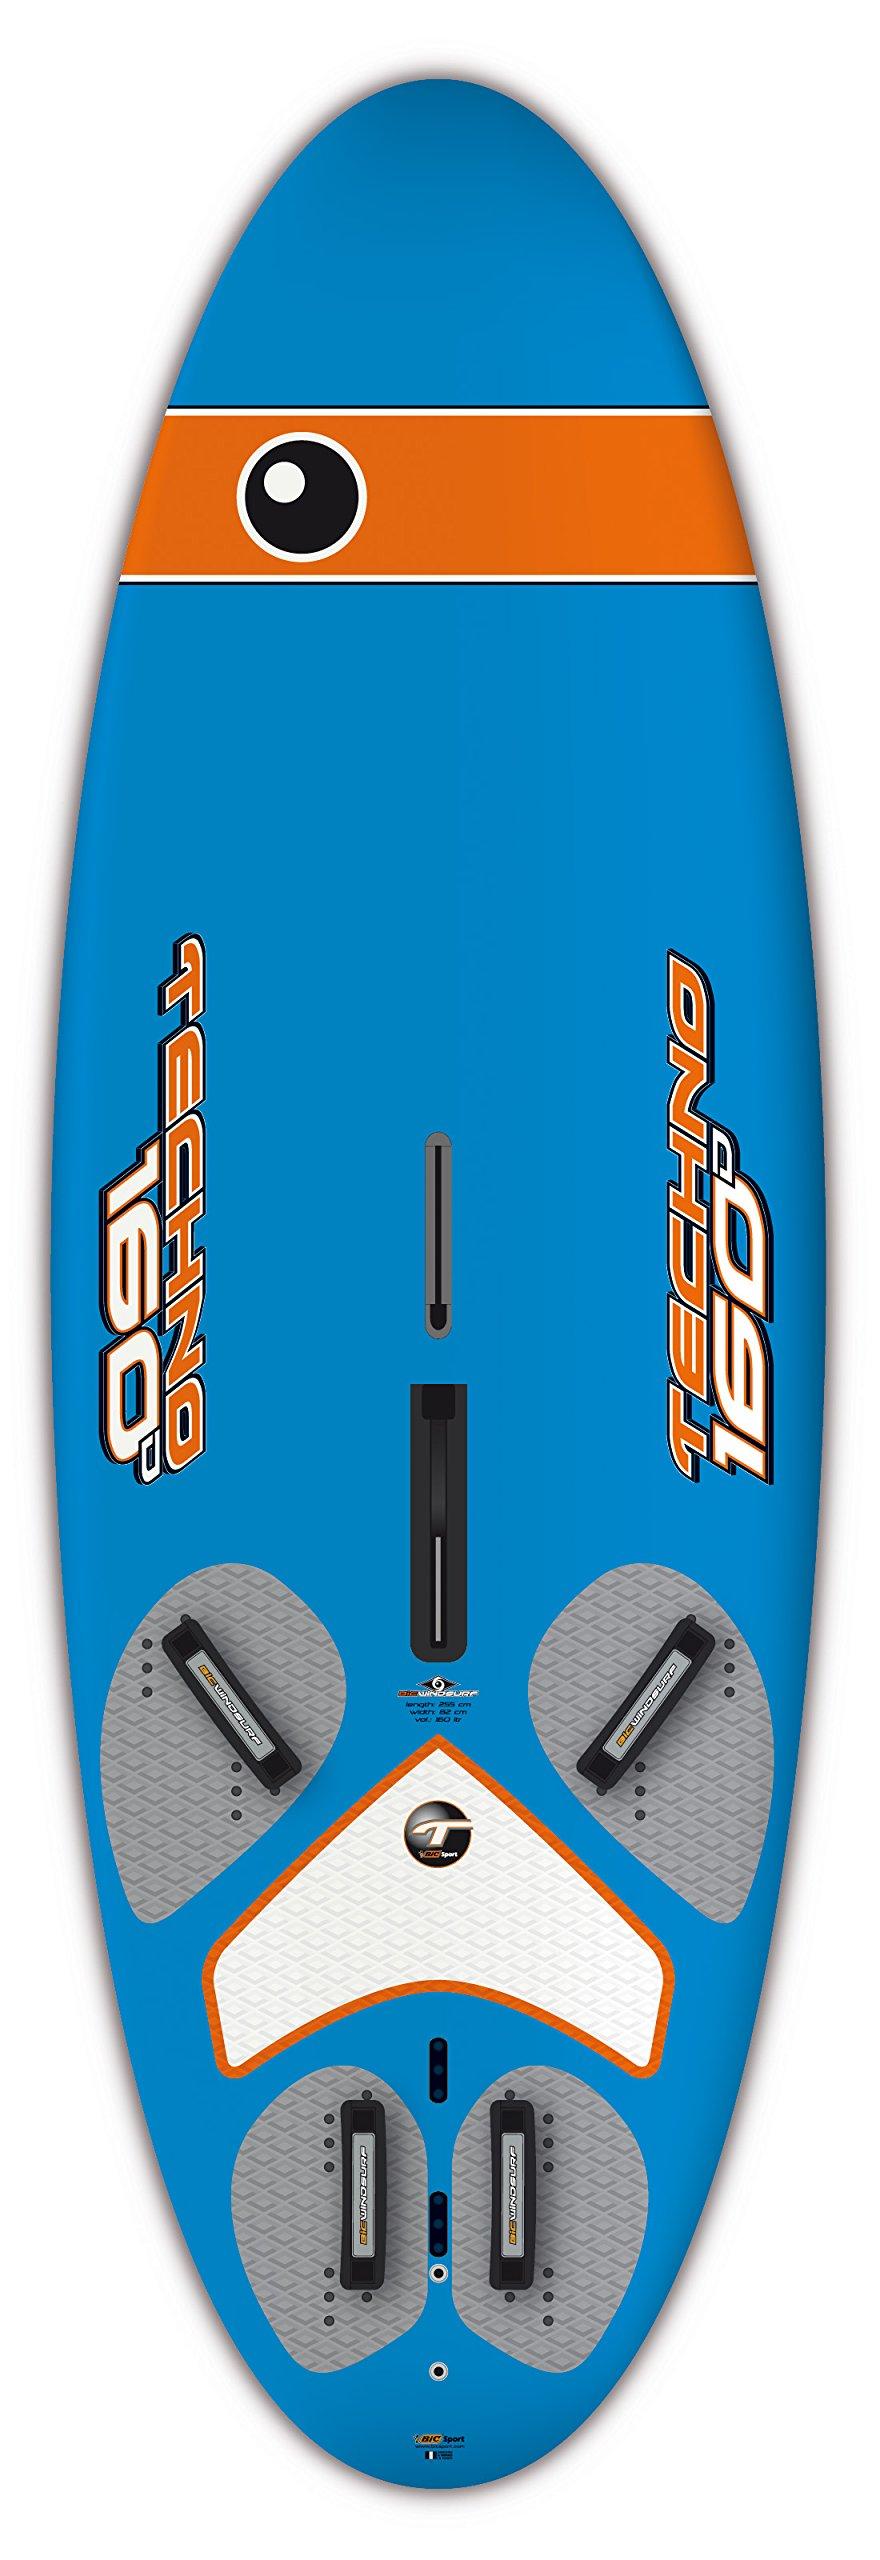 BIC Sport Ace-Tec Techno Wind Surfer Board, 160D, Blue